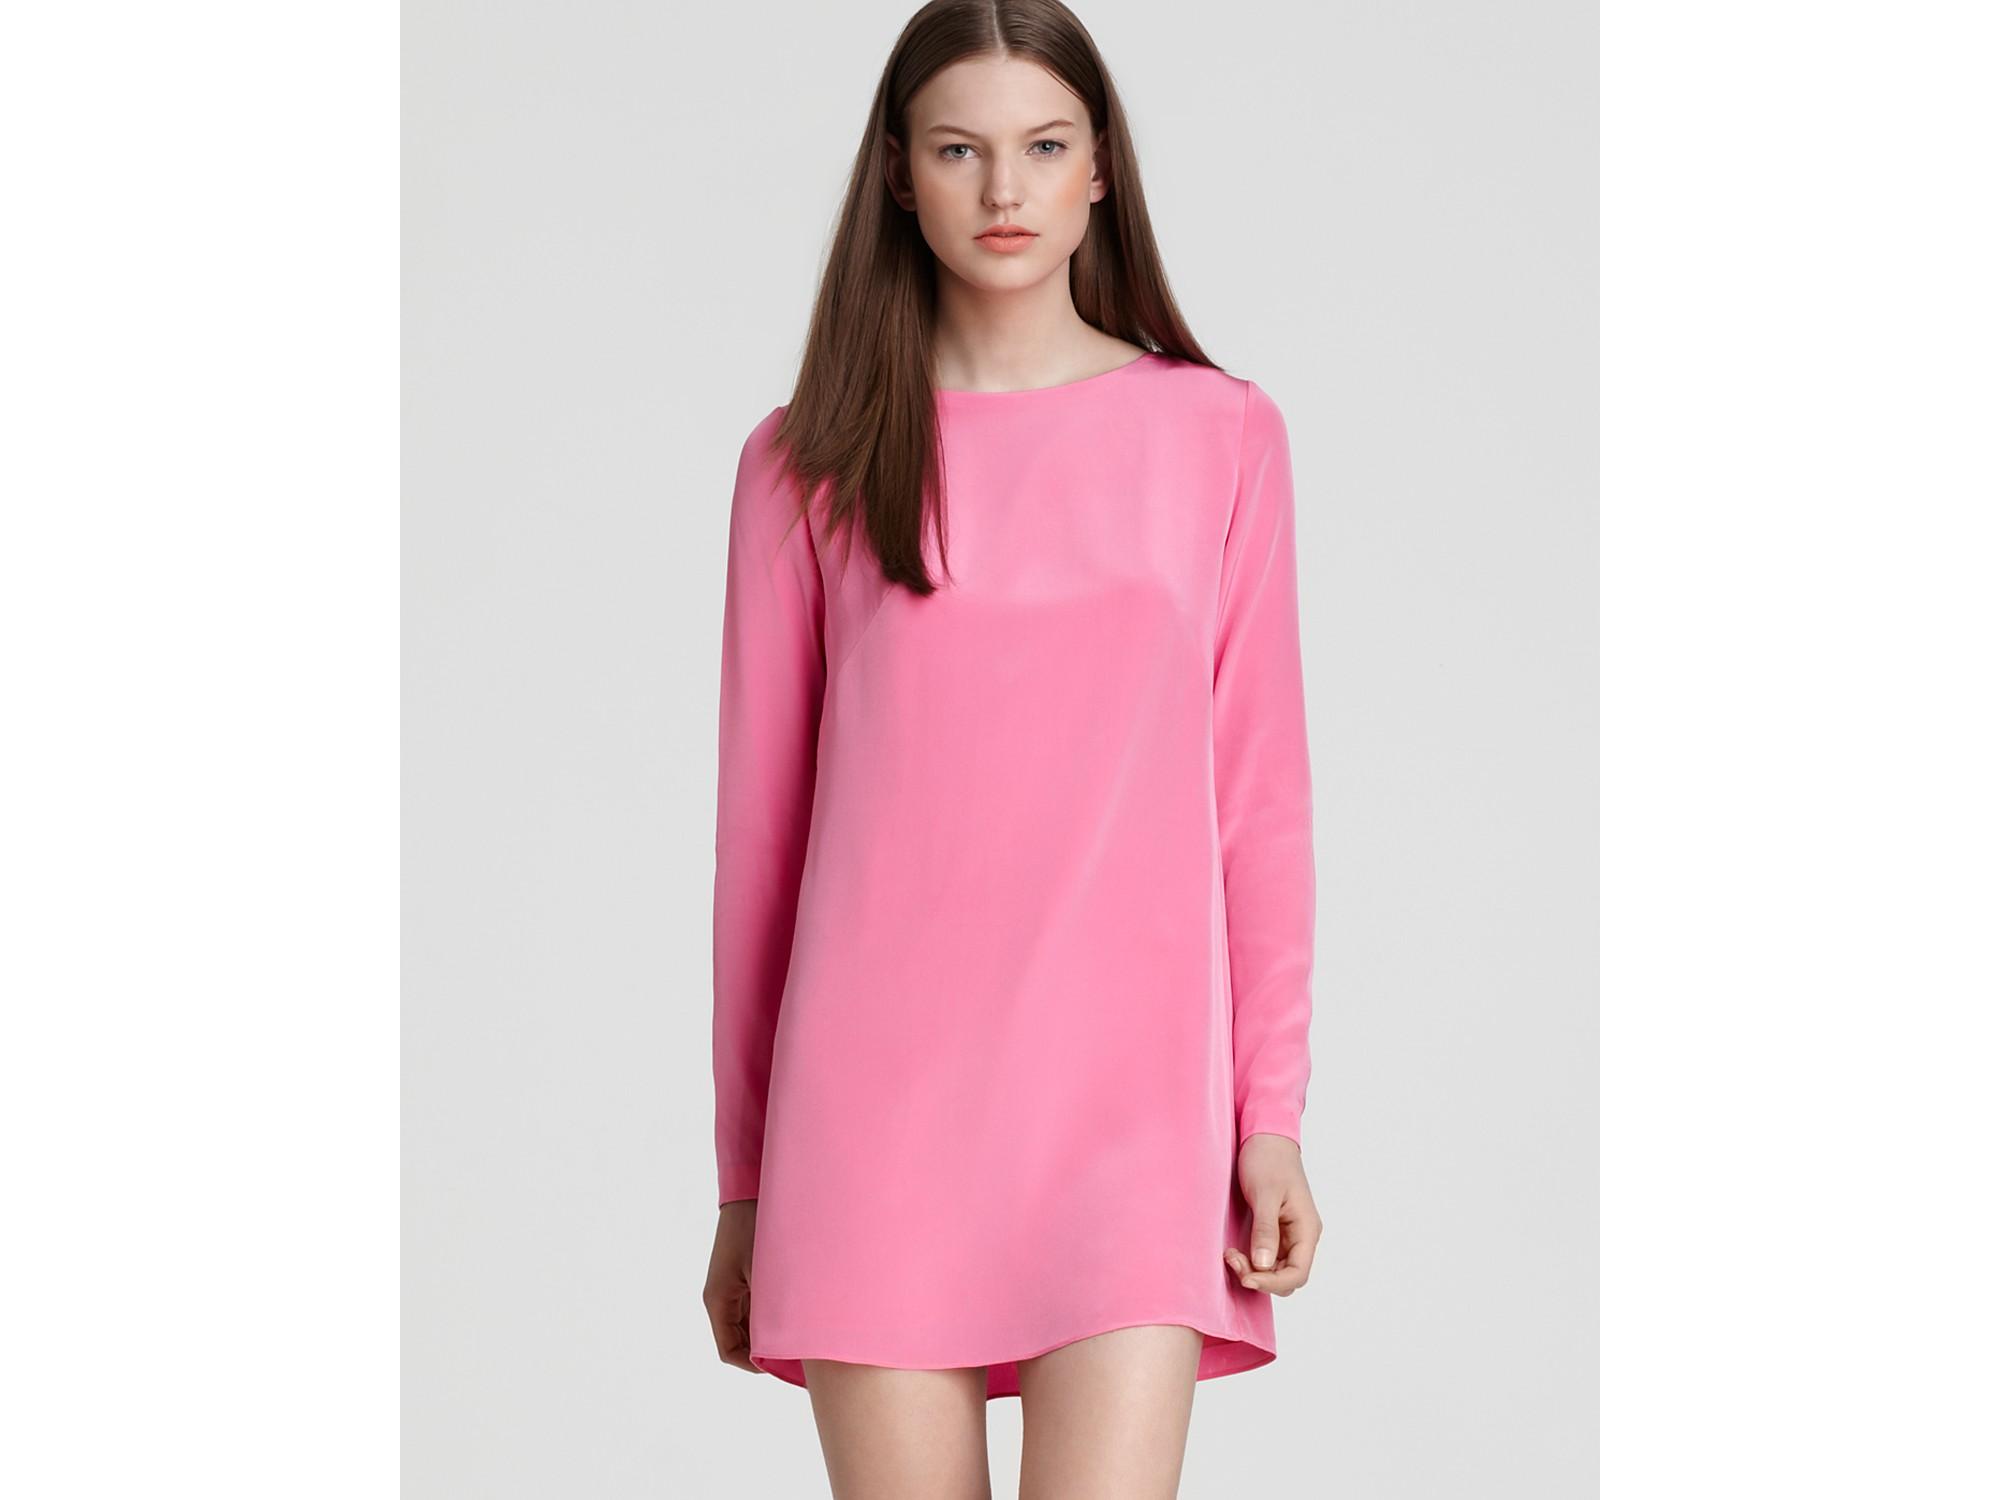 Tibi Shift Dress Long Sleeve in Pink | Lyst